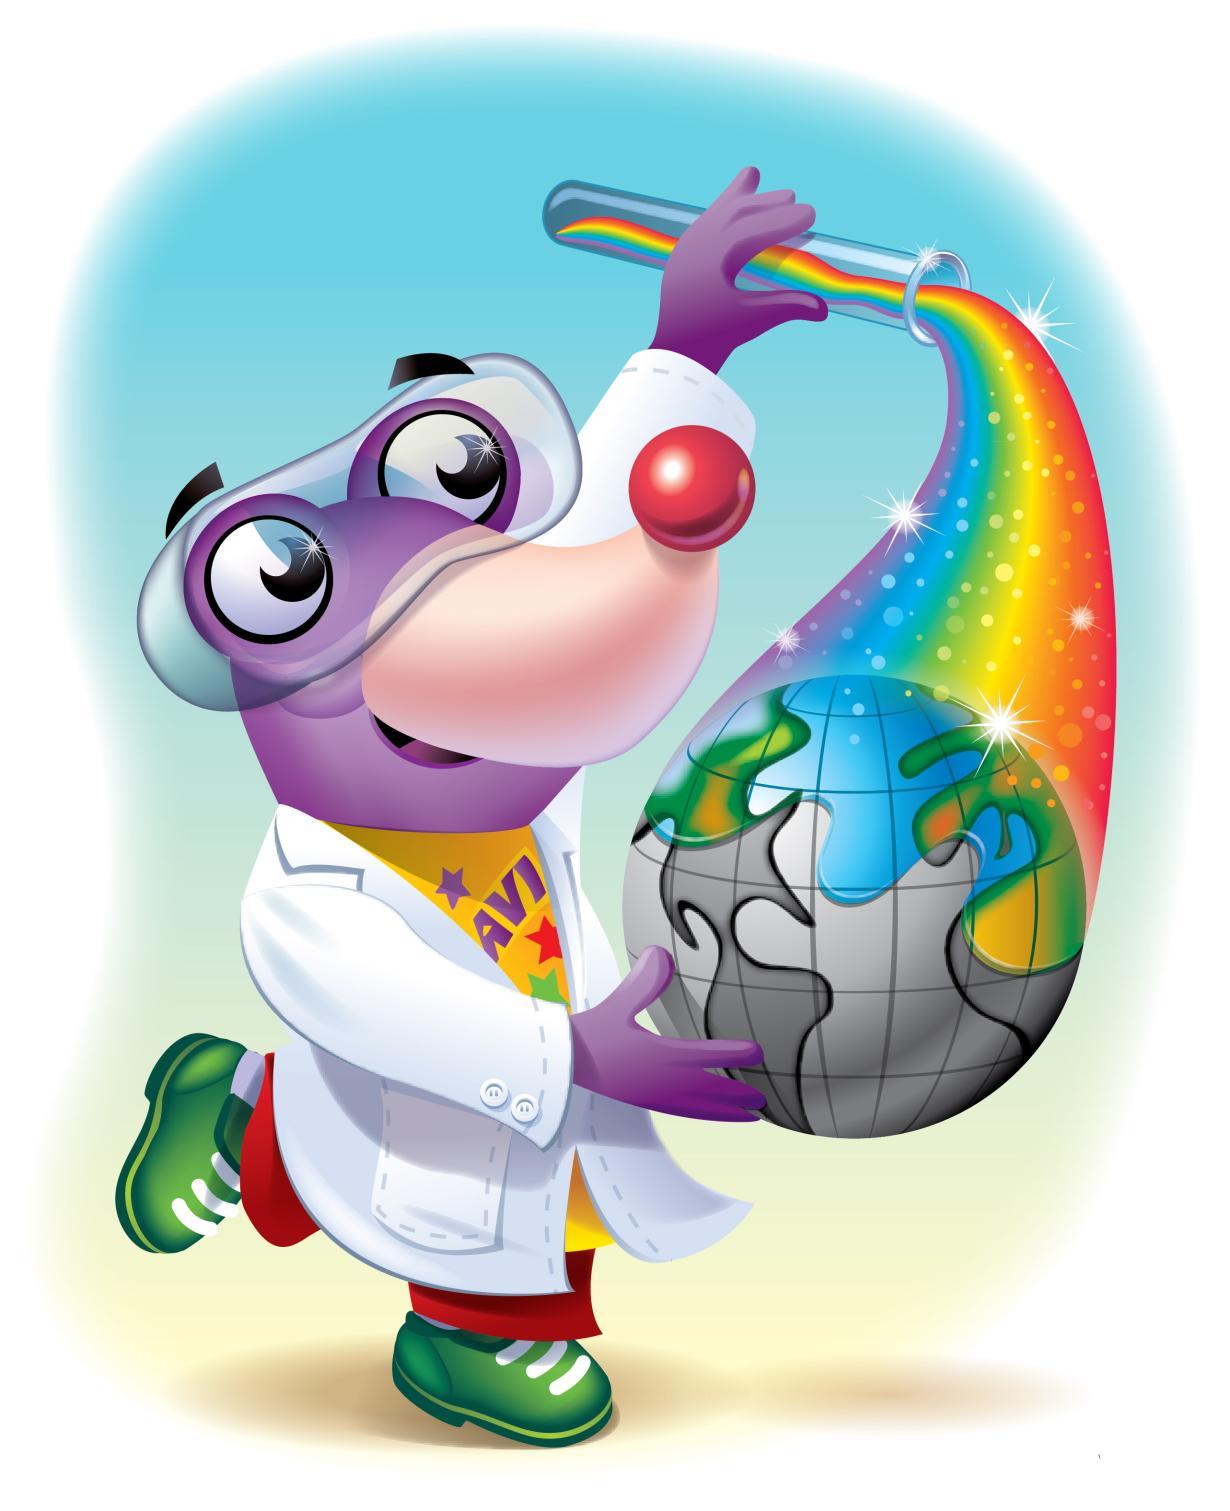 National Chemistry Week 2015 logo - avi mole with rainbow test-tube